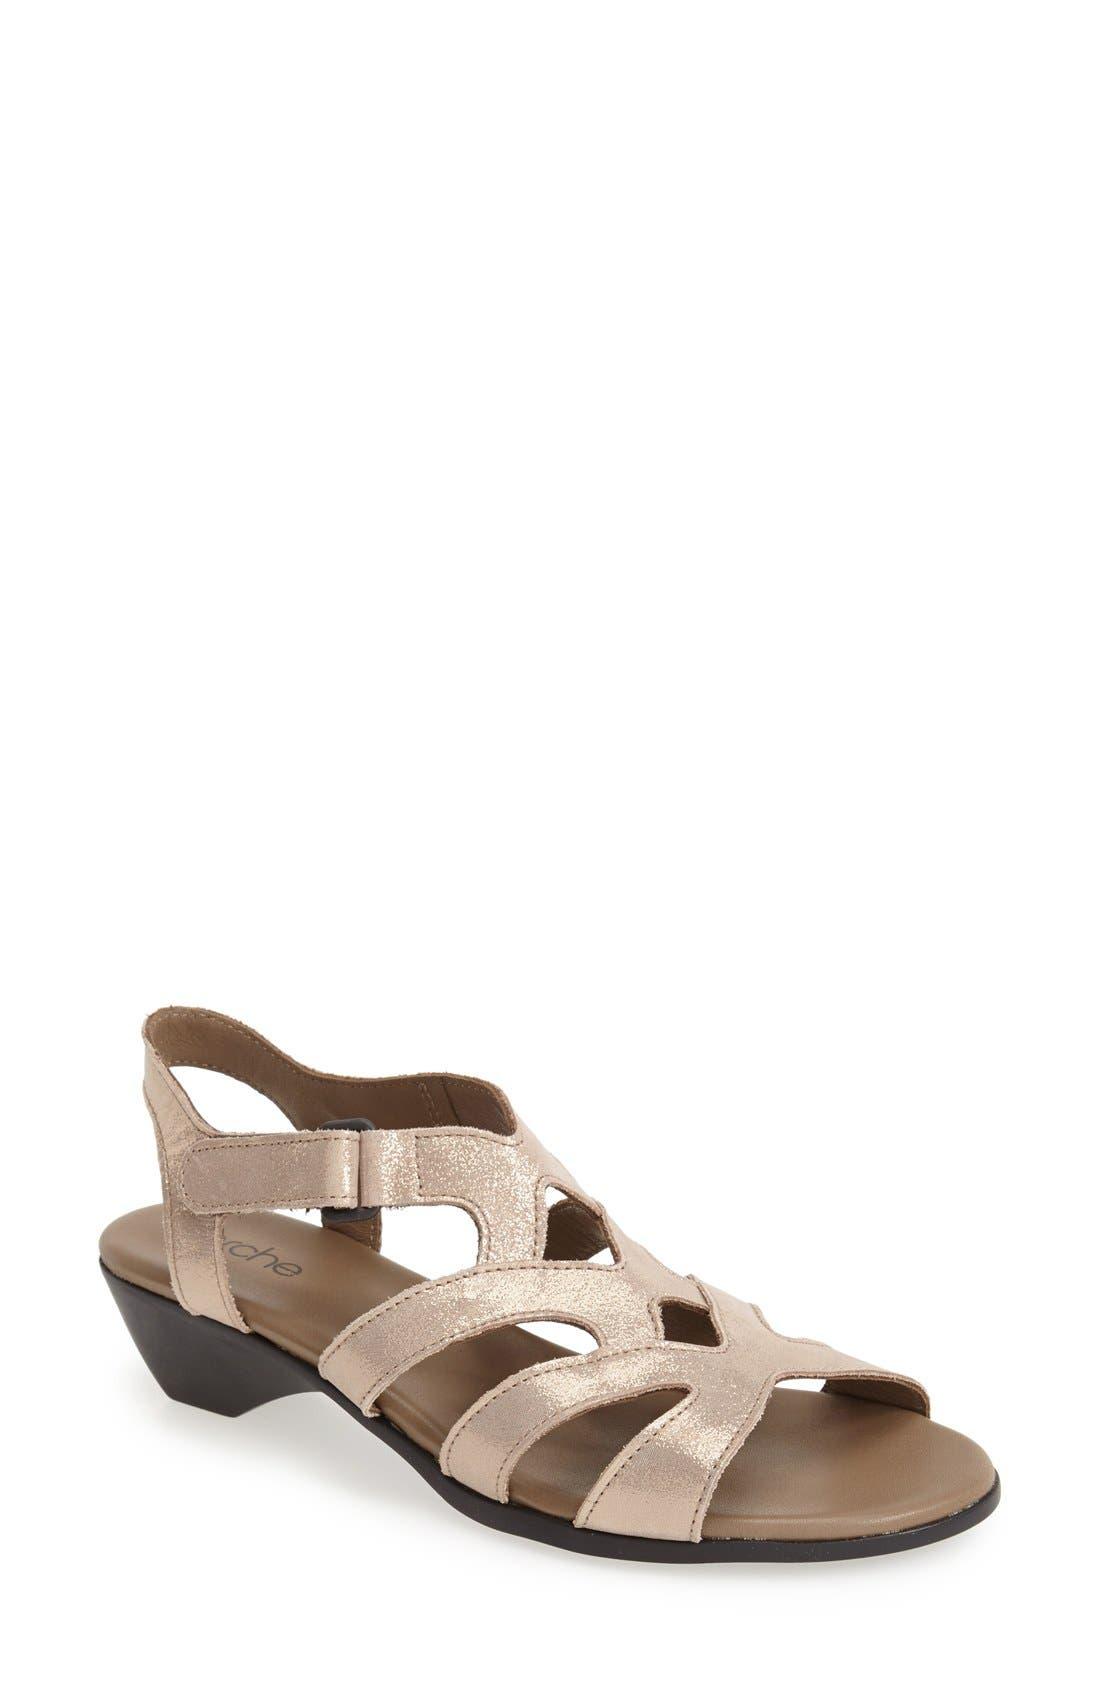 'Obela' Water Resistant Leather Sandal,                             Main thumbnail 3, color,